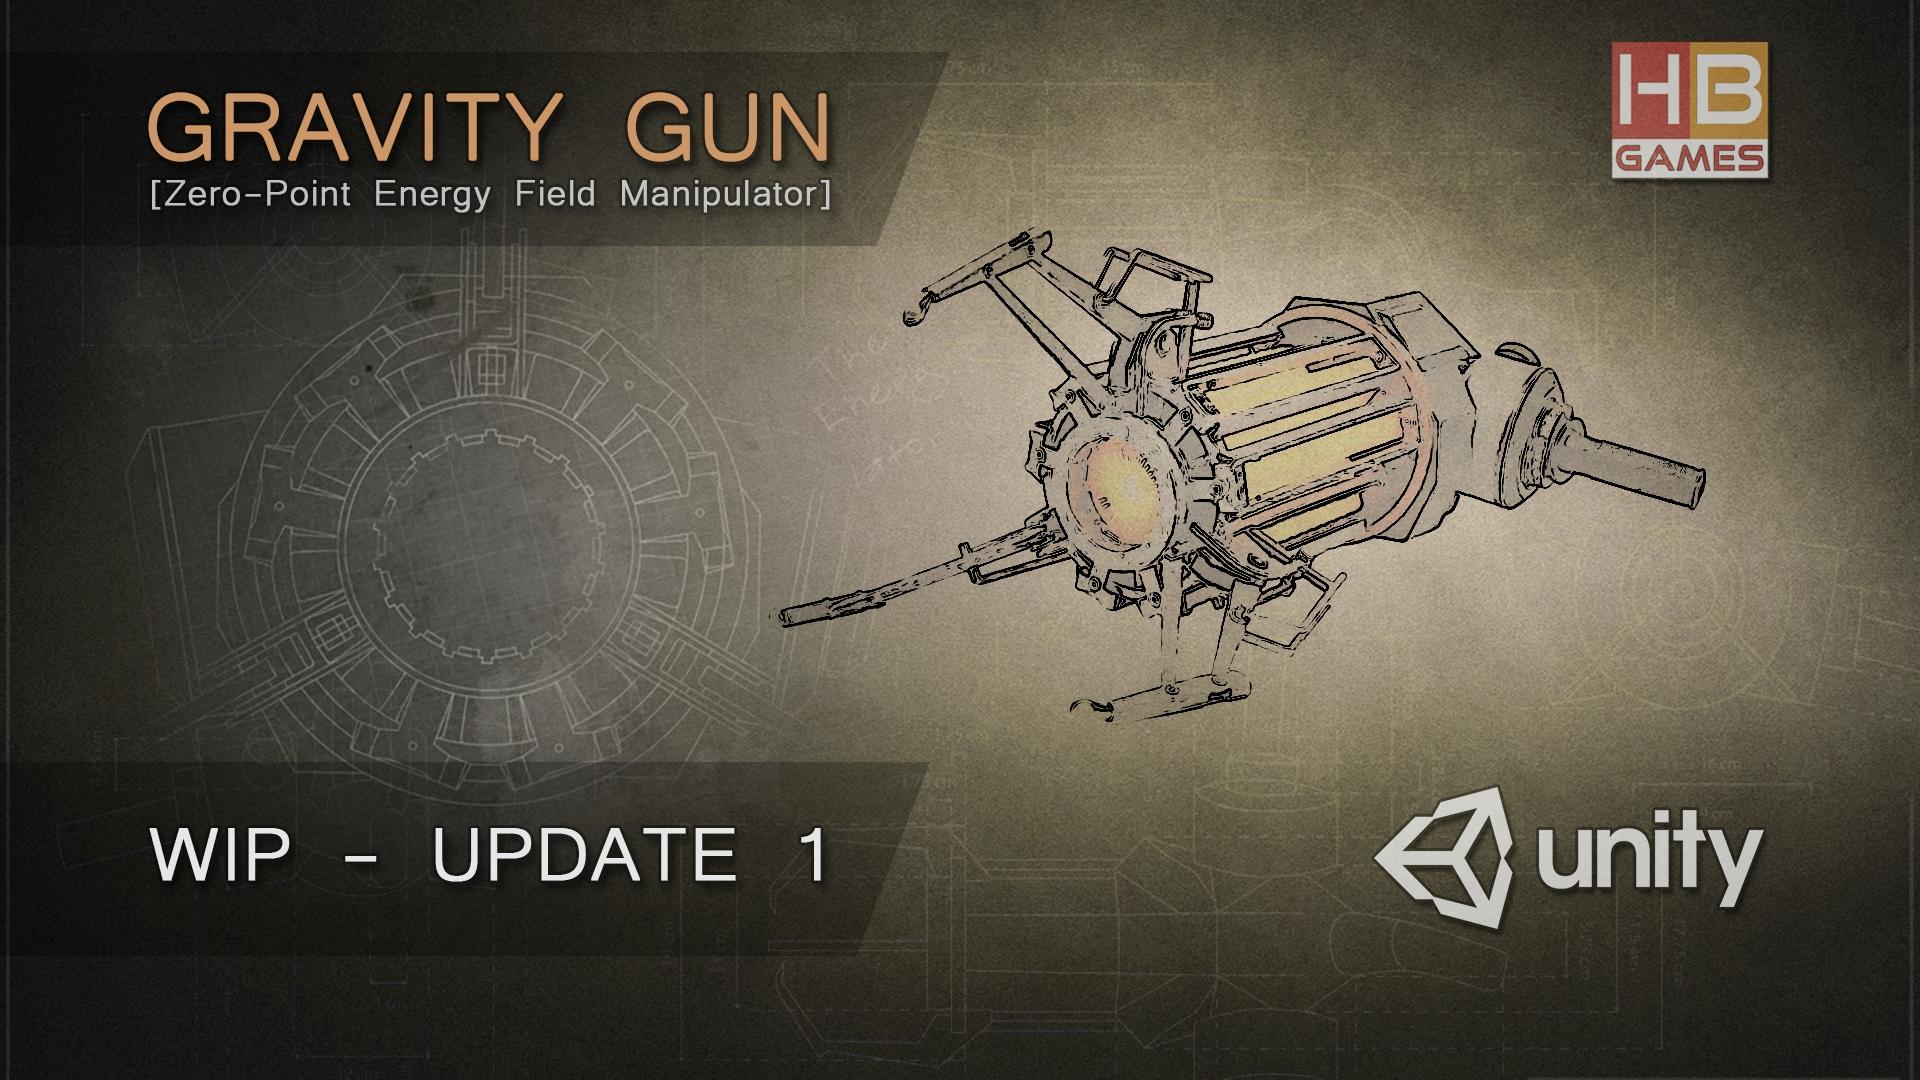 Half-Life's Gravity Gun